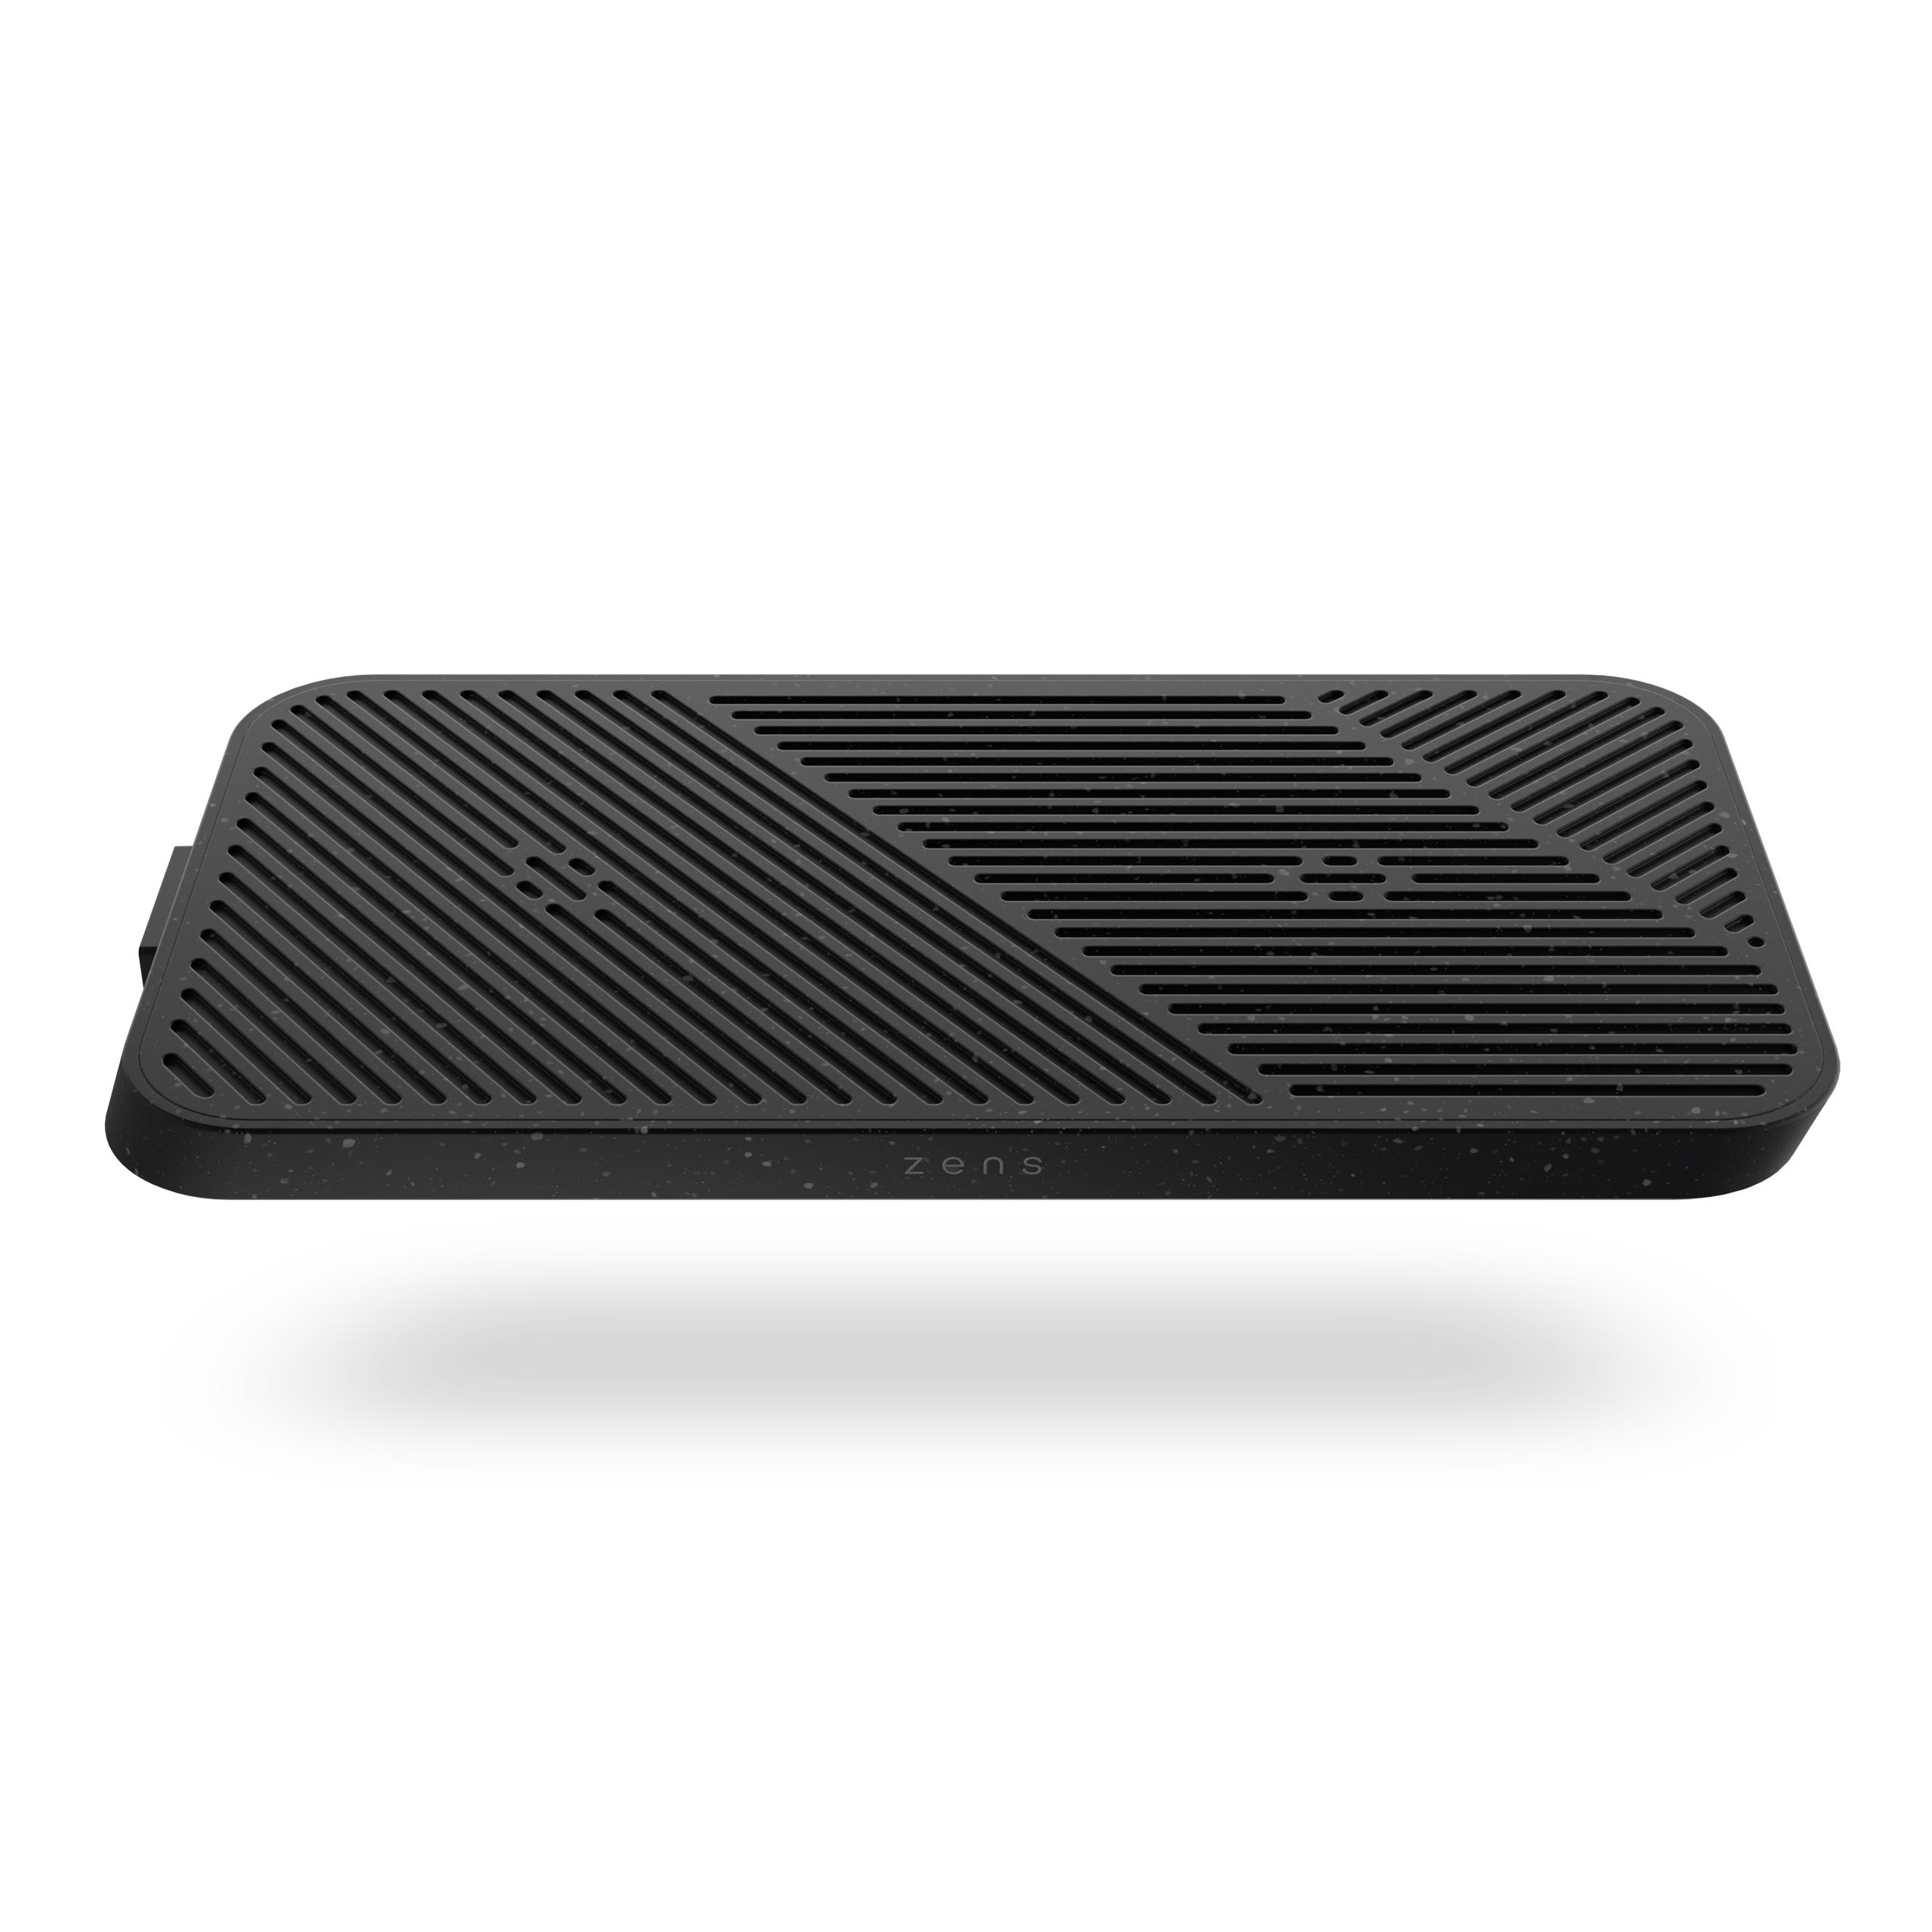 ZEMDC01P Zens Modular Dual Wireless Charger Main Station Front Top View